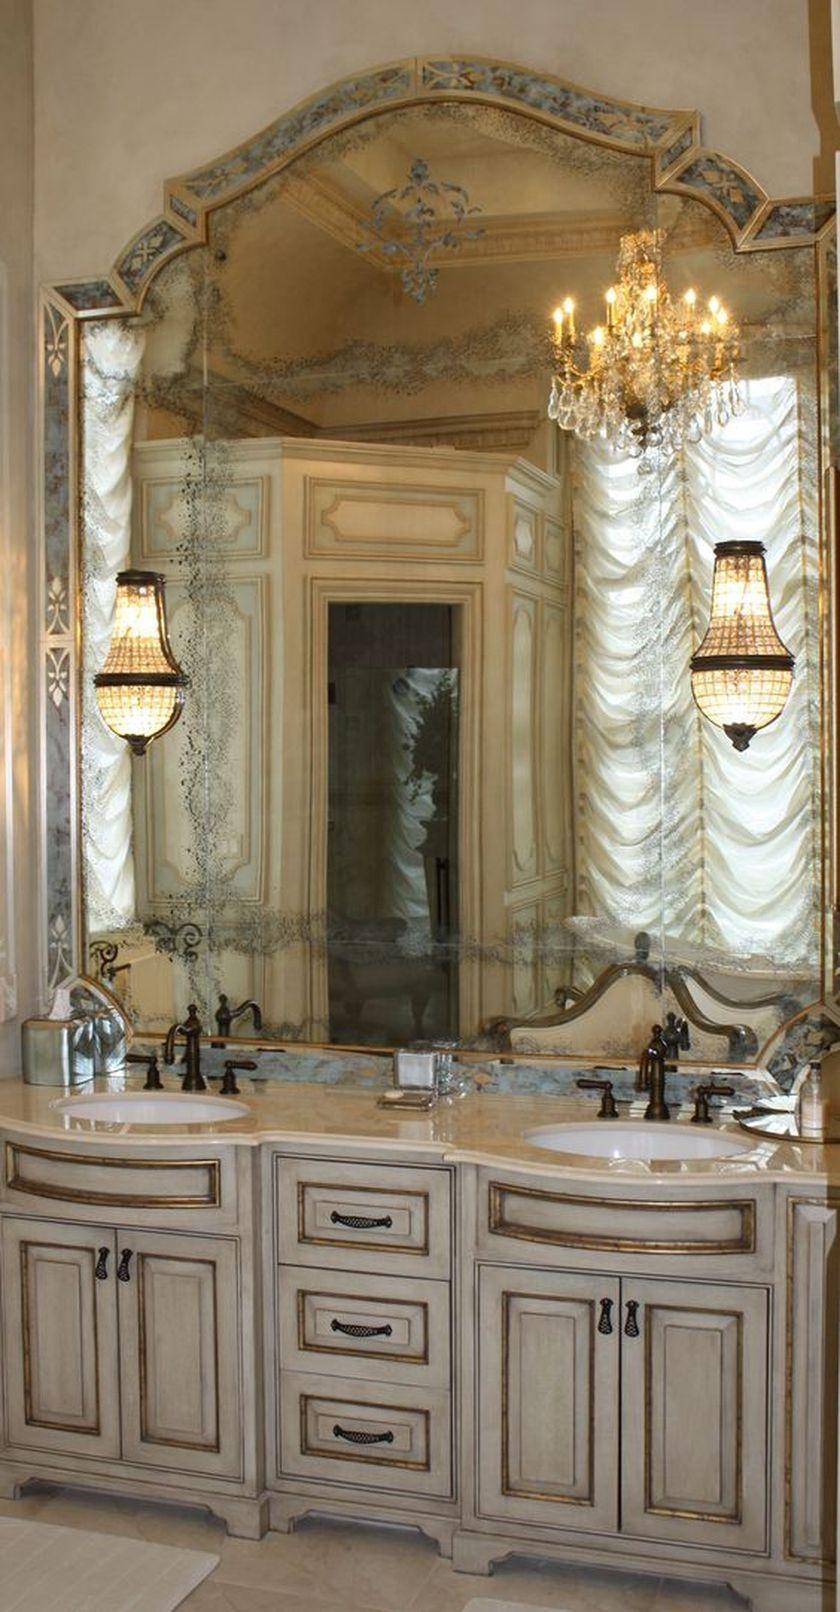 Awesome Country Mirror Bathroom Decor Ideas